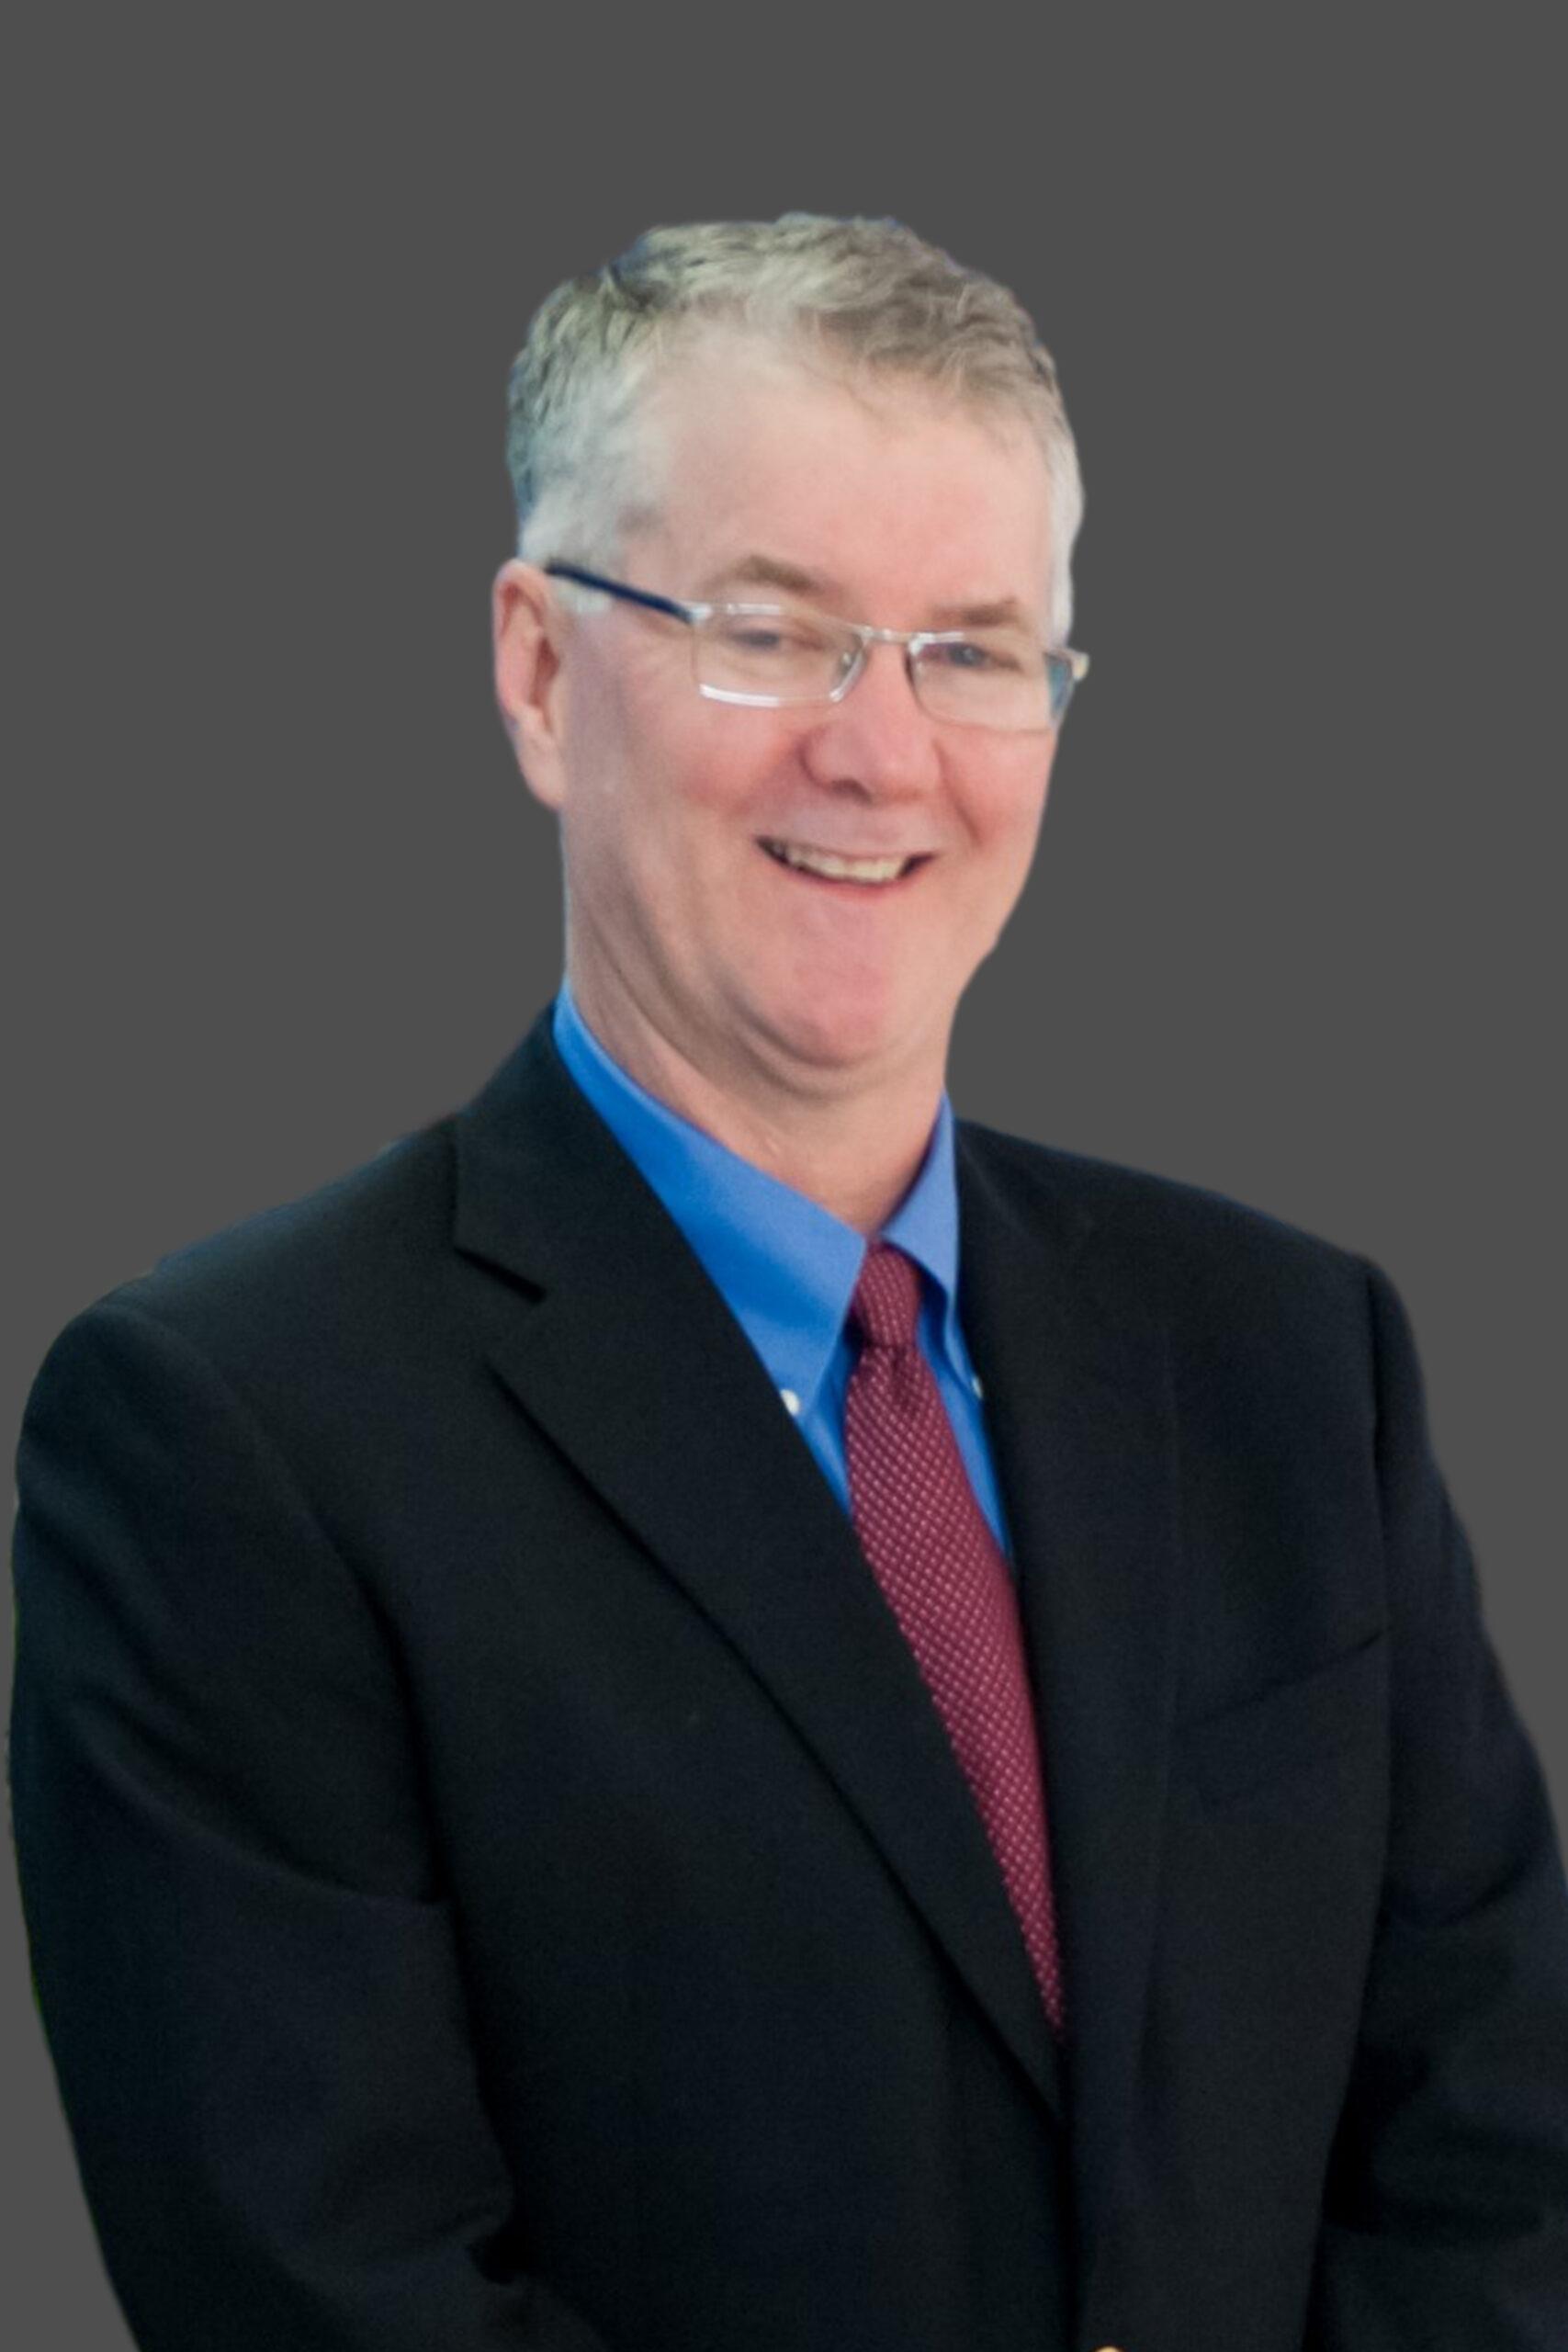 Lawrence A. Lavery, DPM, MPH